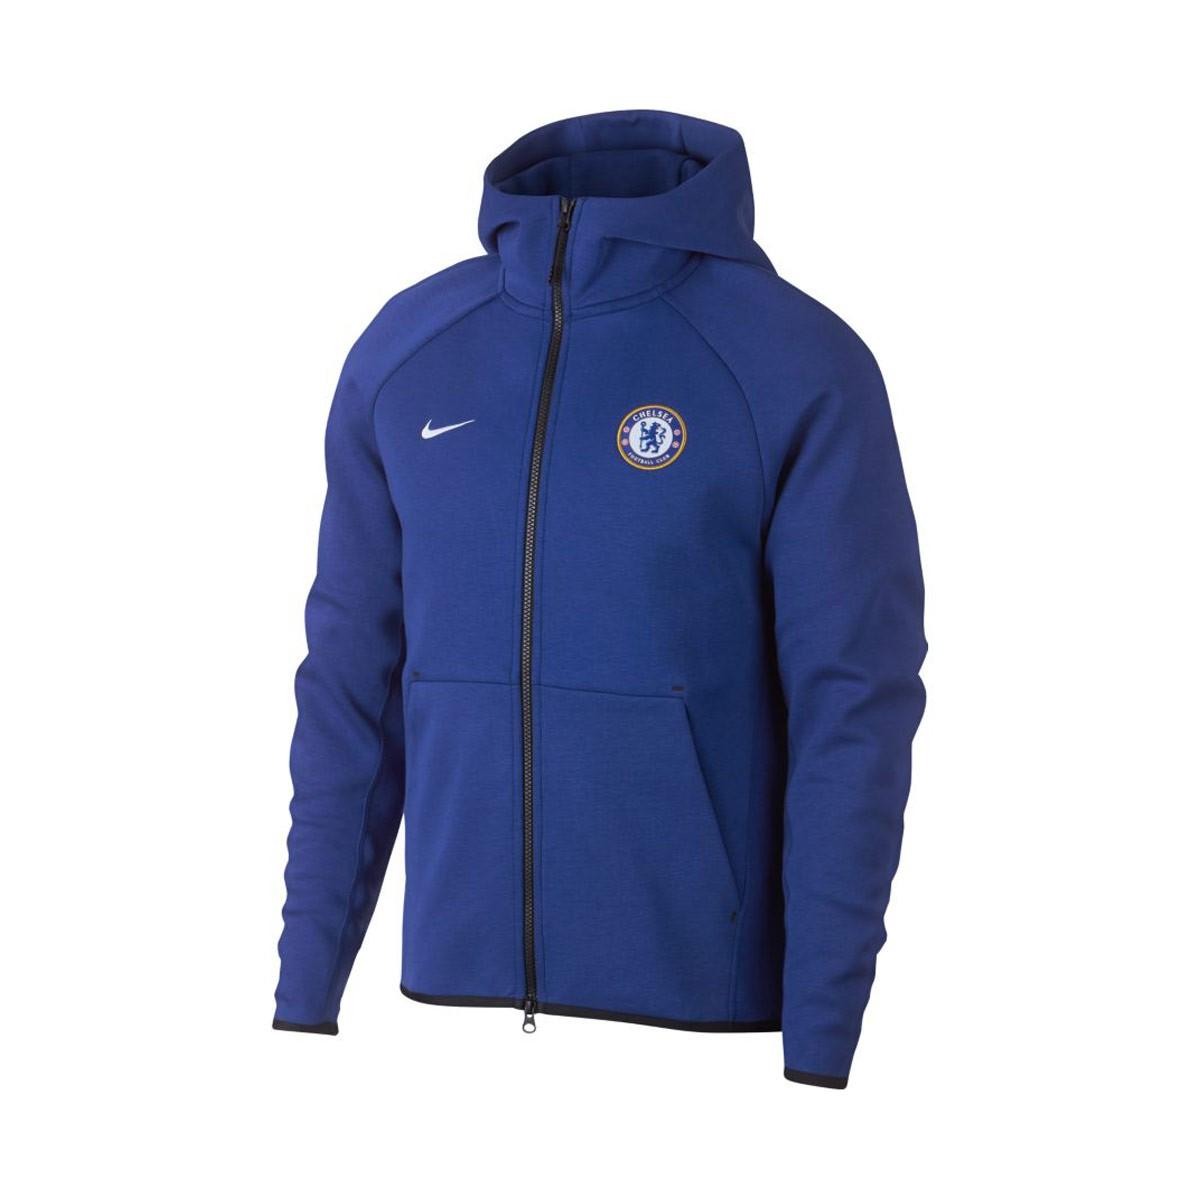 a9fb38ac0f2a Jacket Nike NSW Chelsea FC Tech Fleece 2018-2019 Rush blue-White ...